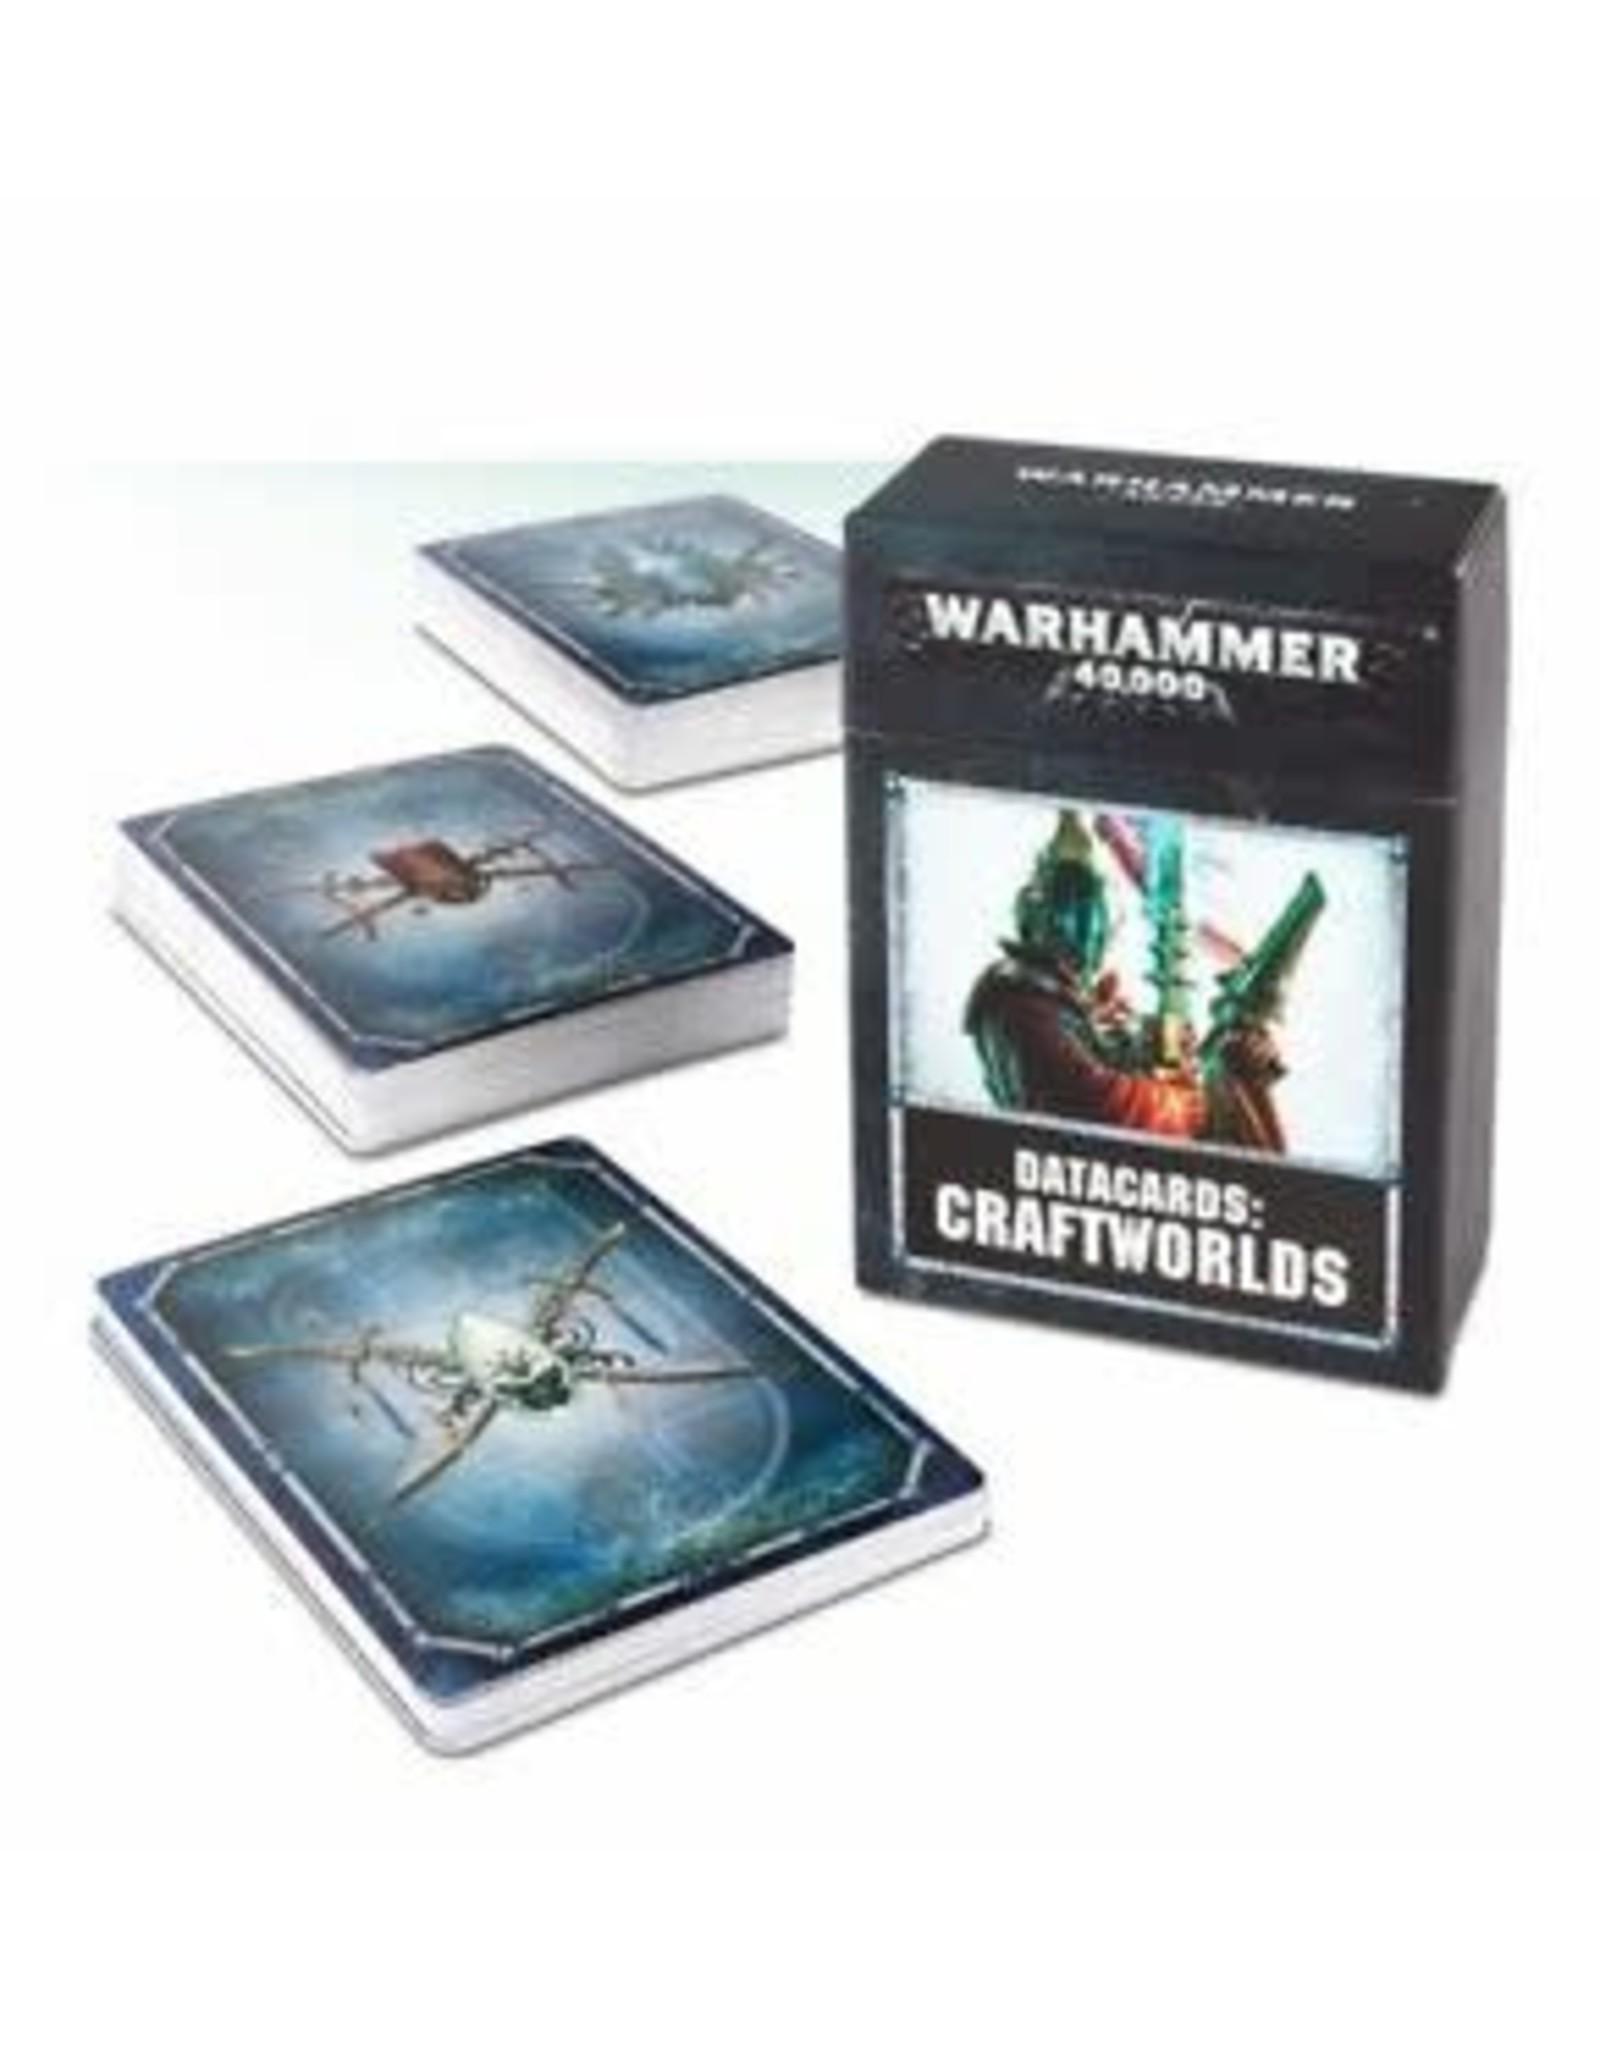 Games Workshop DATACARDS CRAFTWORLDS